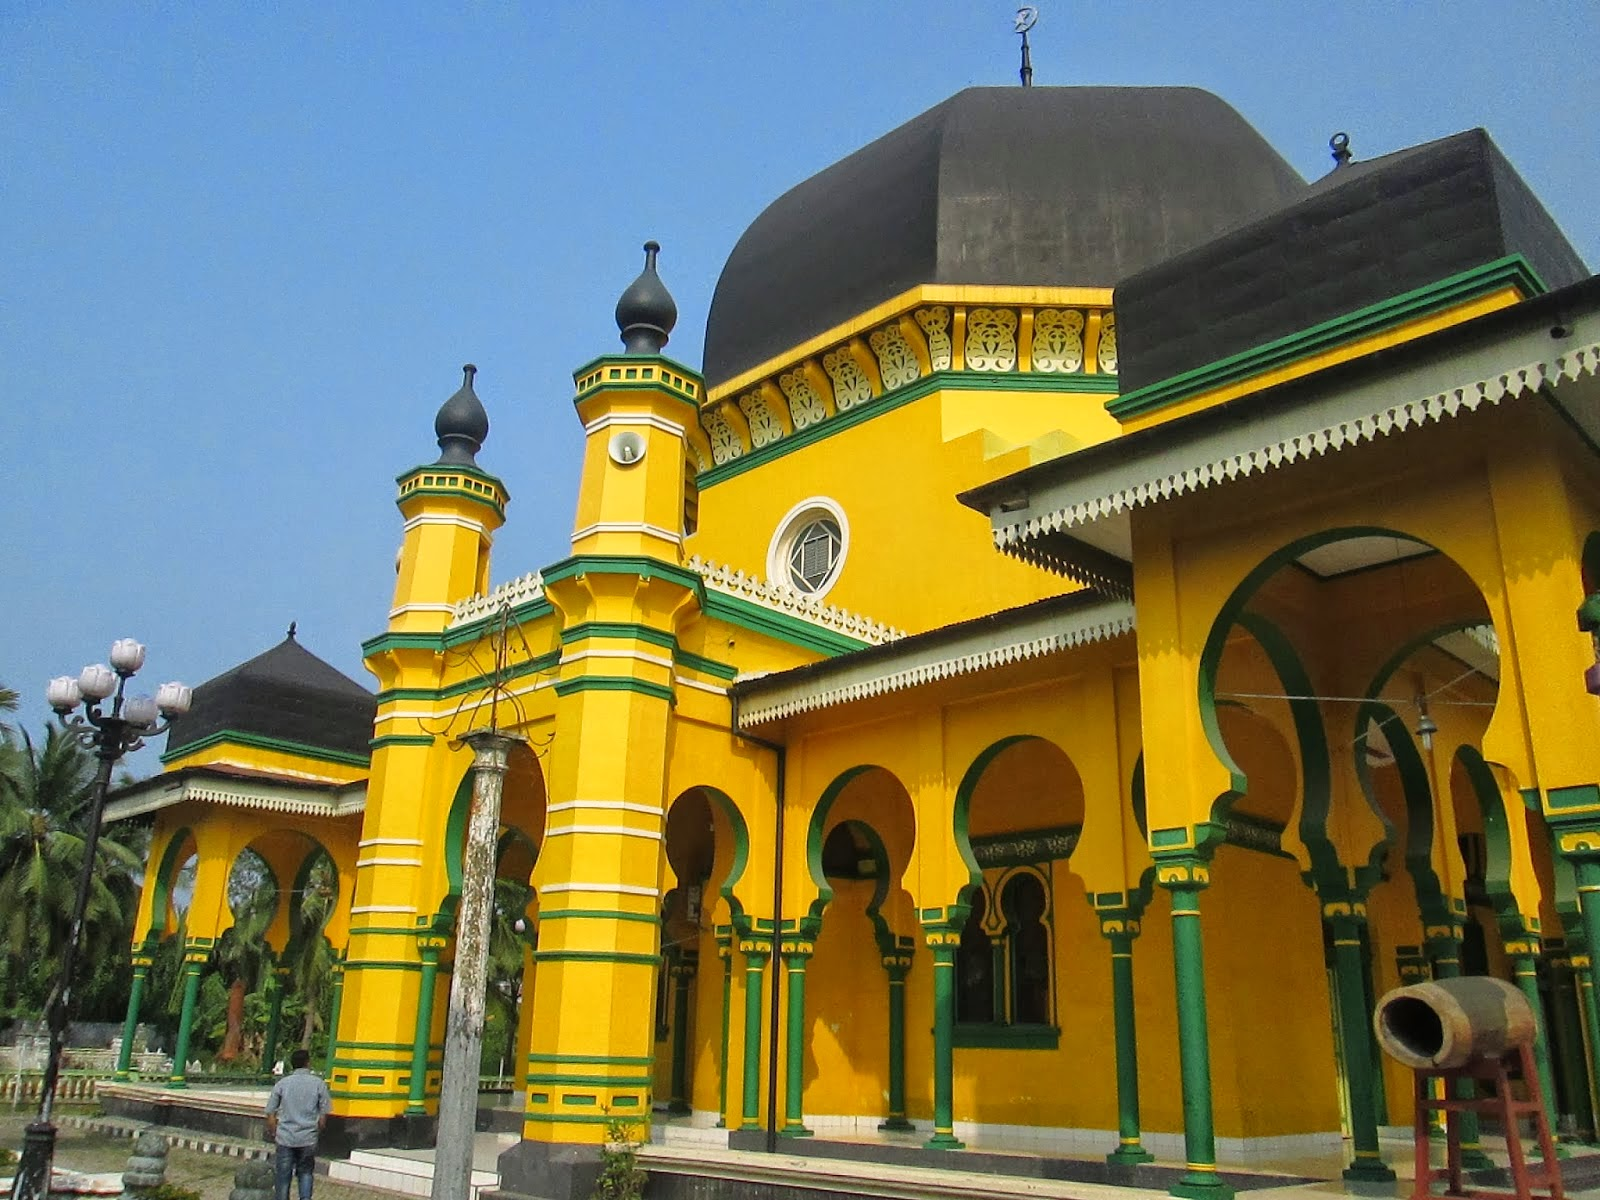 Tempat Wisata Religi Kota Medan Wajib Masjid Al Osmani Salah